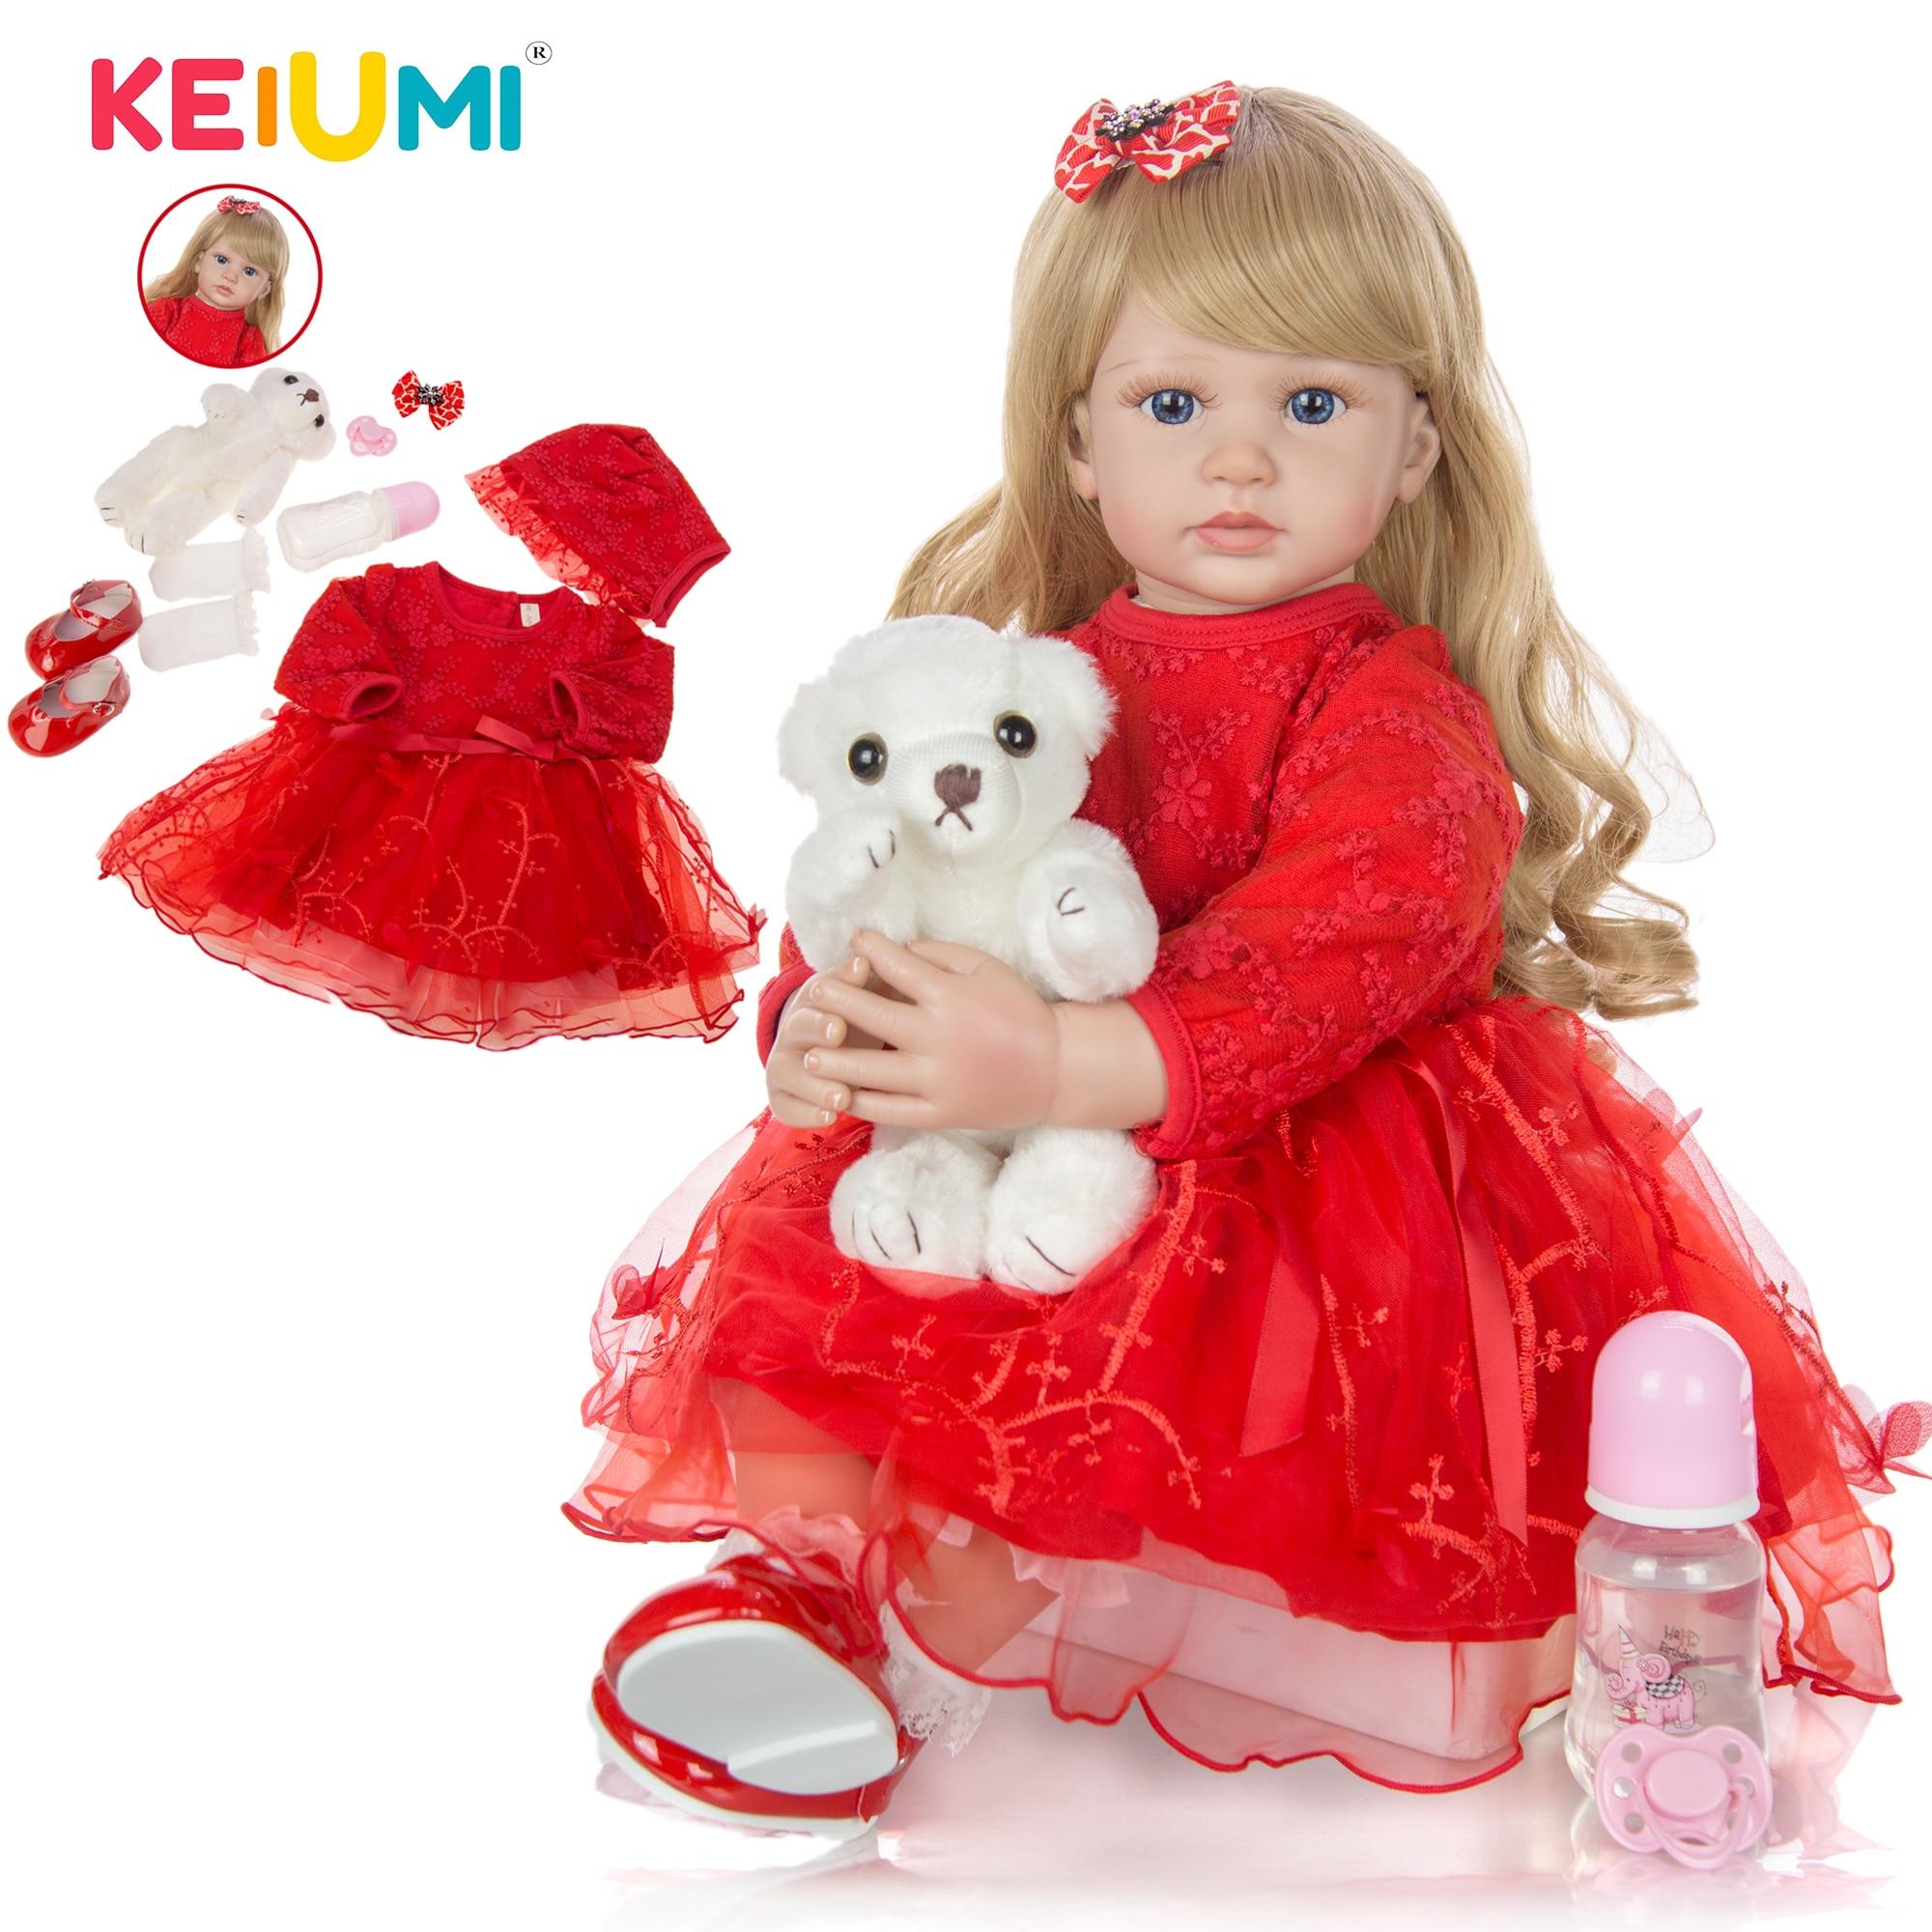 KEIUMI Bebê Reborn Menina Loira Cabelo Longo Princesa Vestido Vermelho Sapatinho Corpo Silicone Olhos Azuis Aniversário Presente